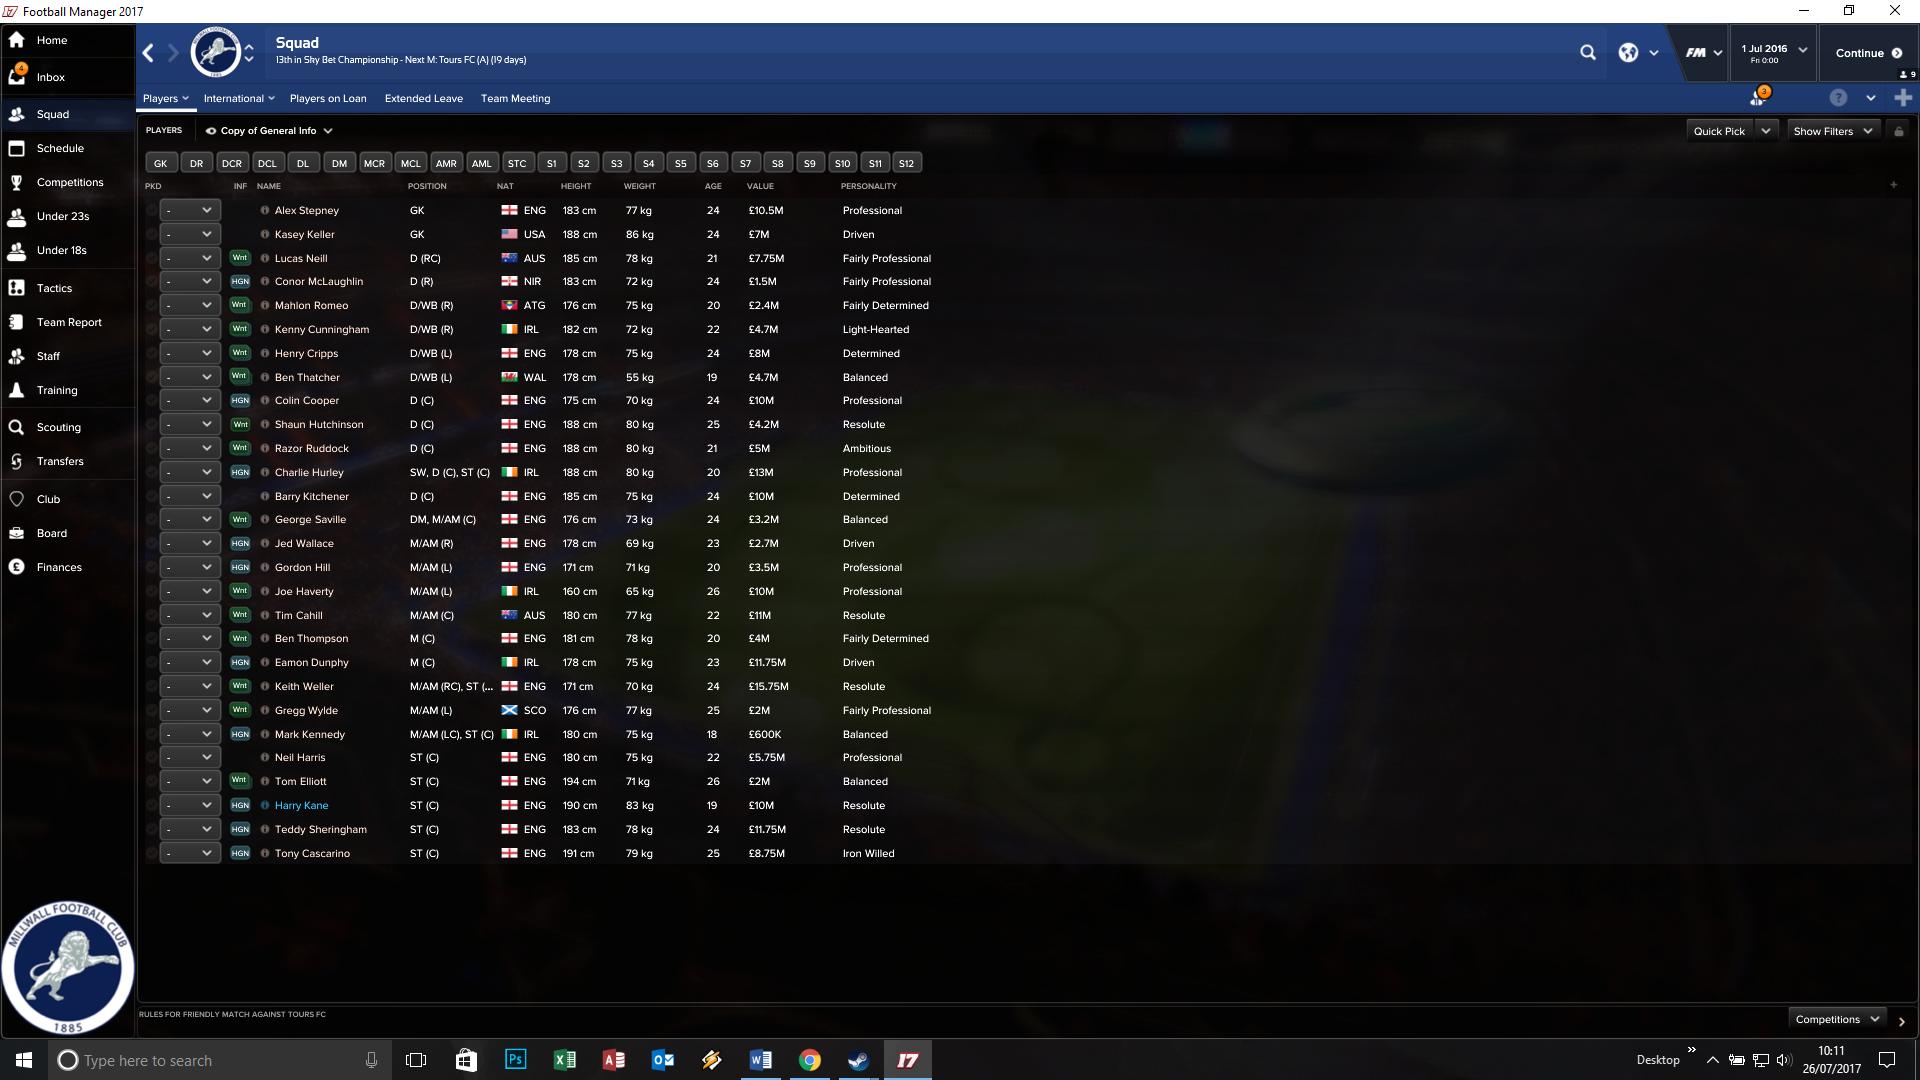 Millwall_Squad.png